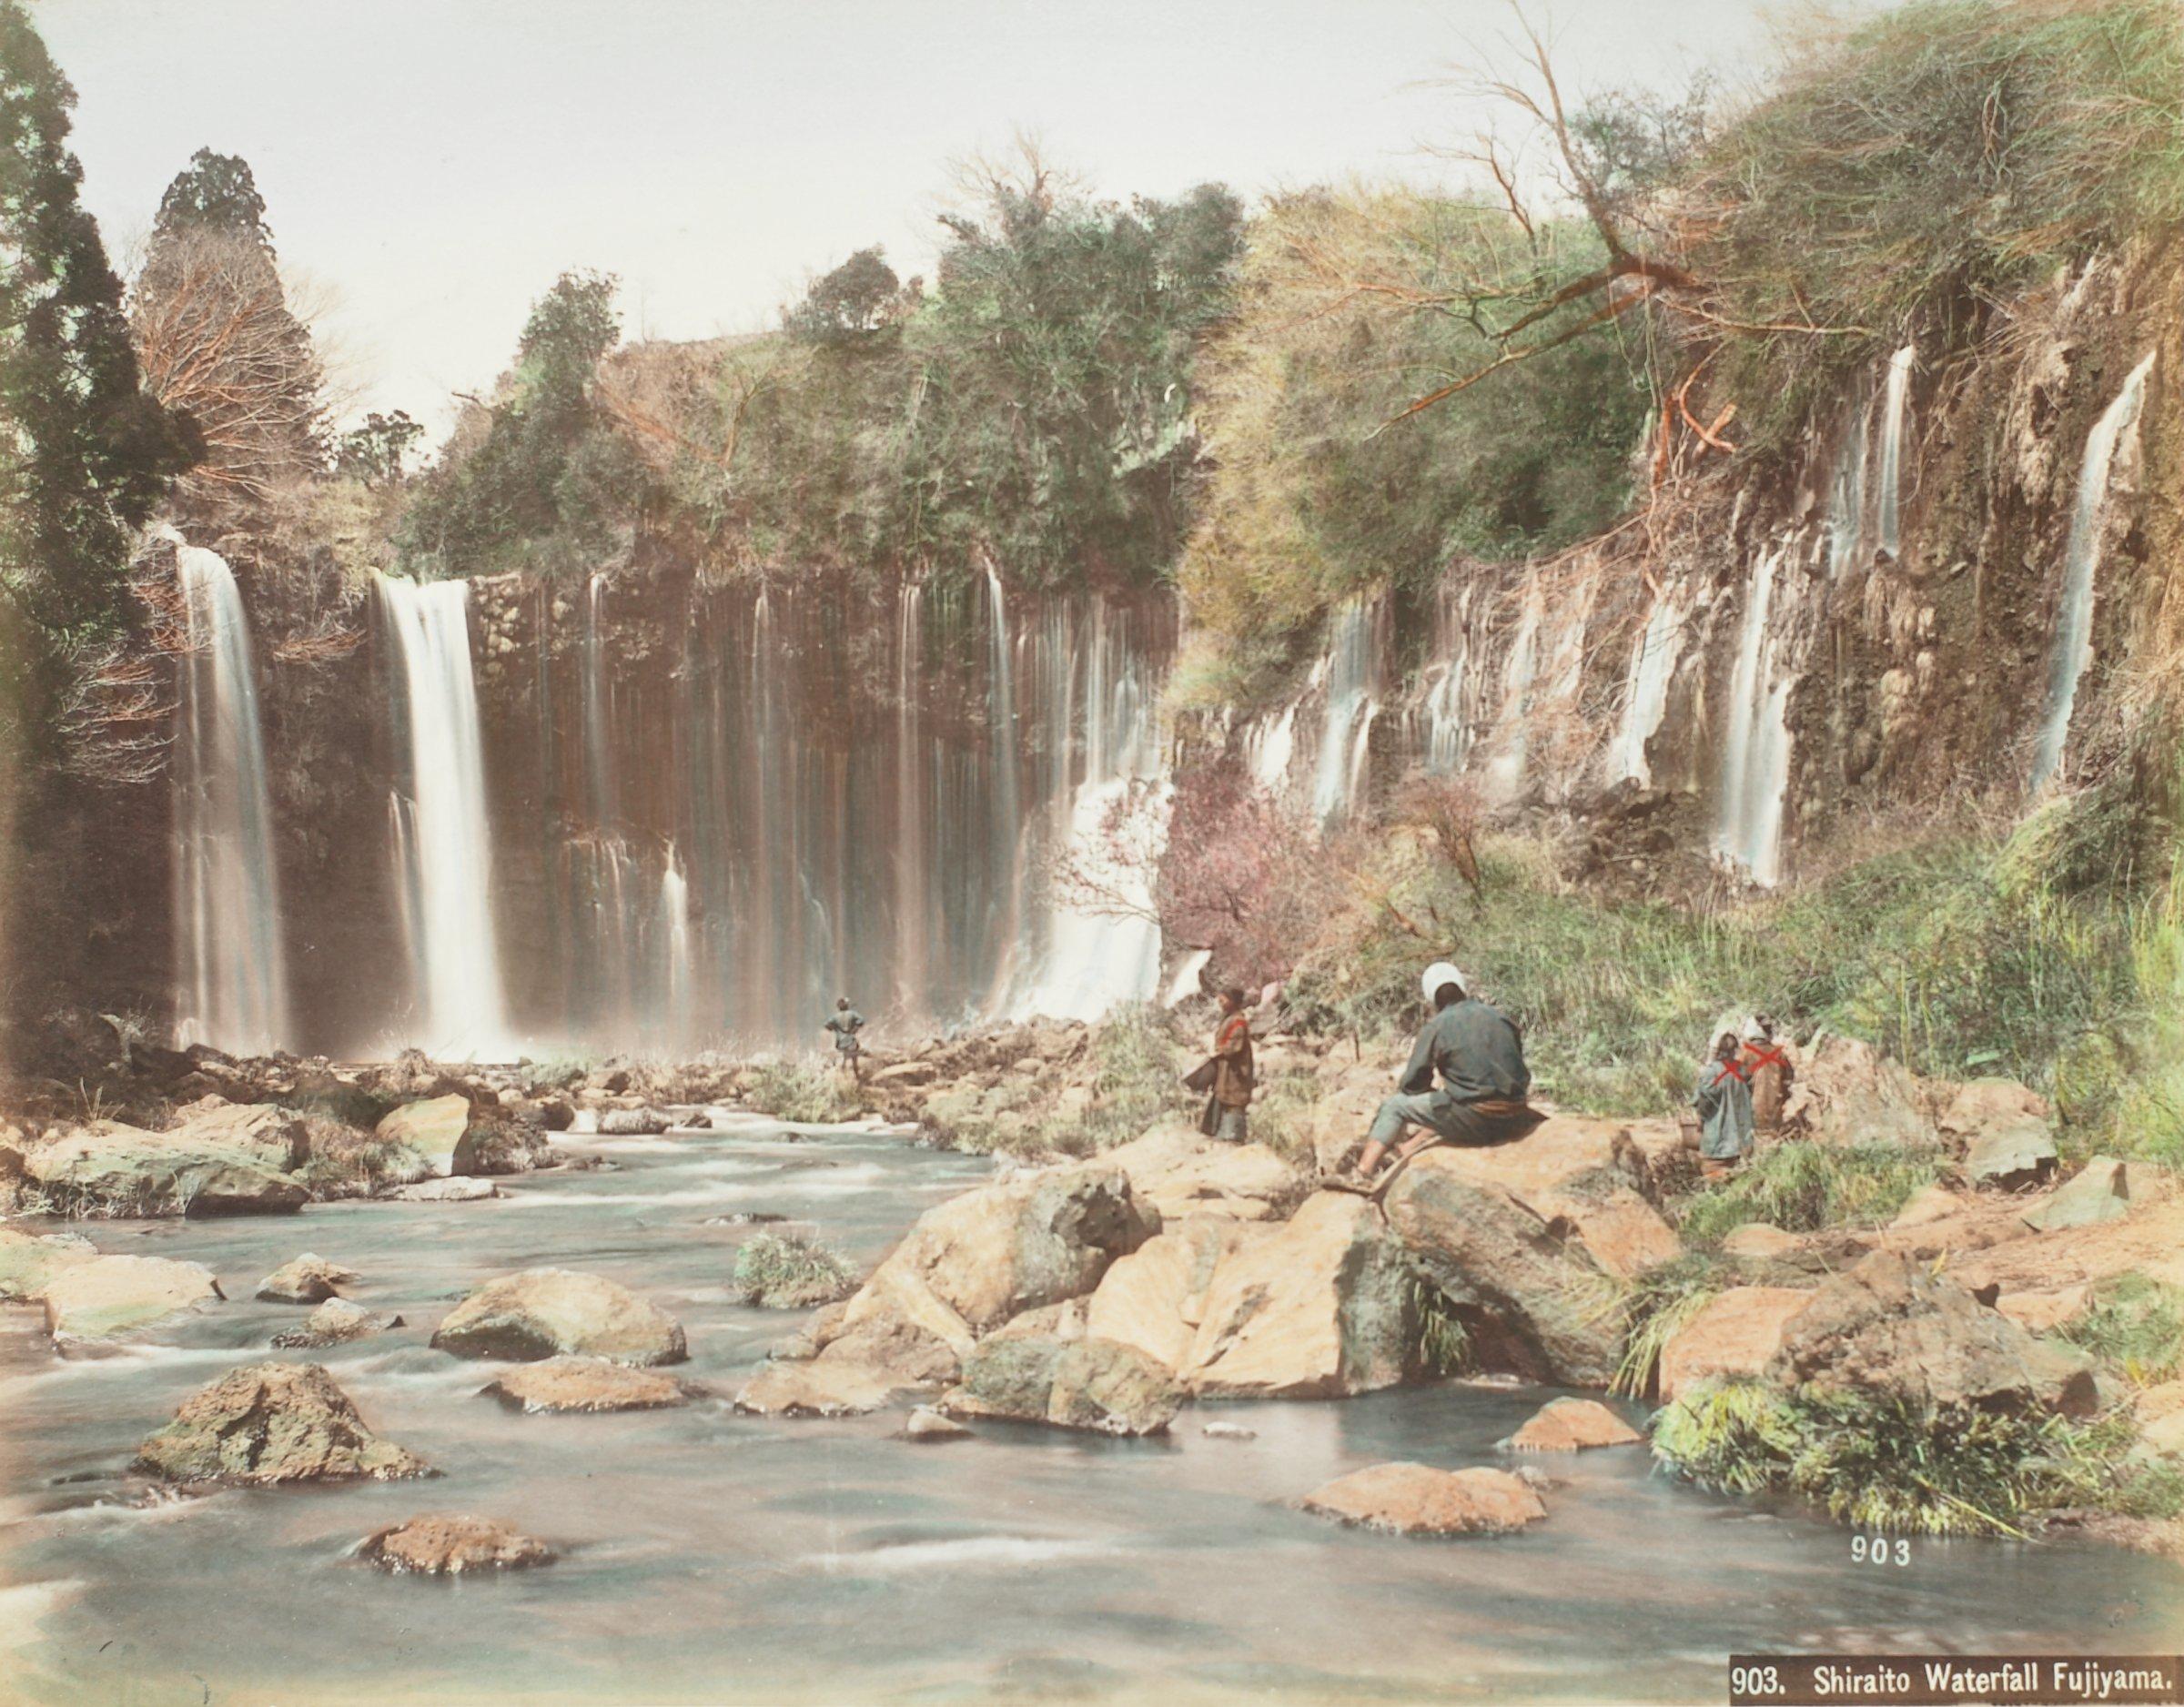 Fujiyama From Omiya Village (.32, recto); Shiraito Waterfall Fujiyama (.33, verso), Attributed to Kusakabe Kimbei, hand-colored albumen prints mounted to album page